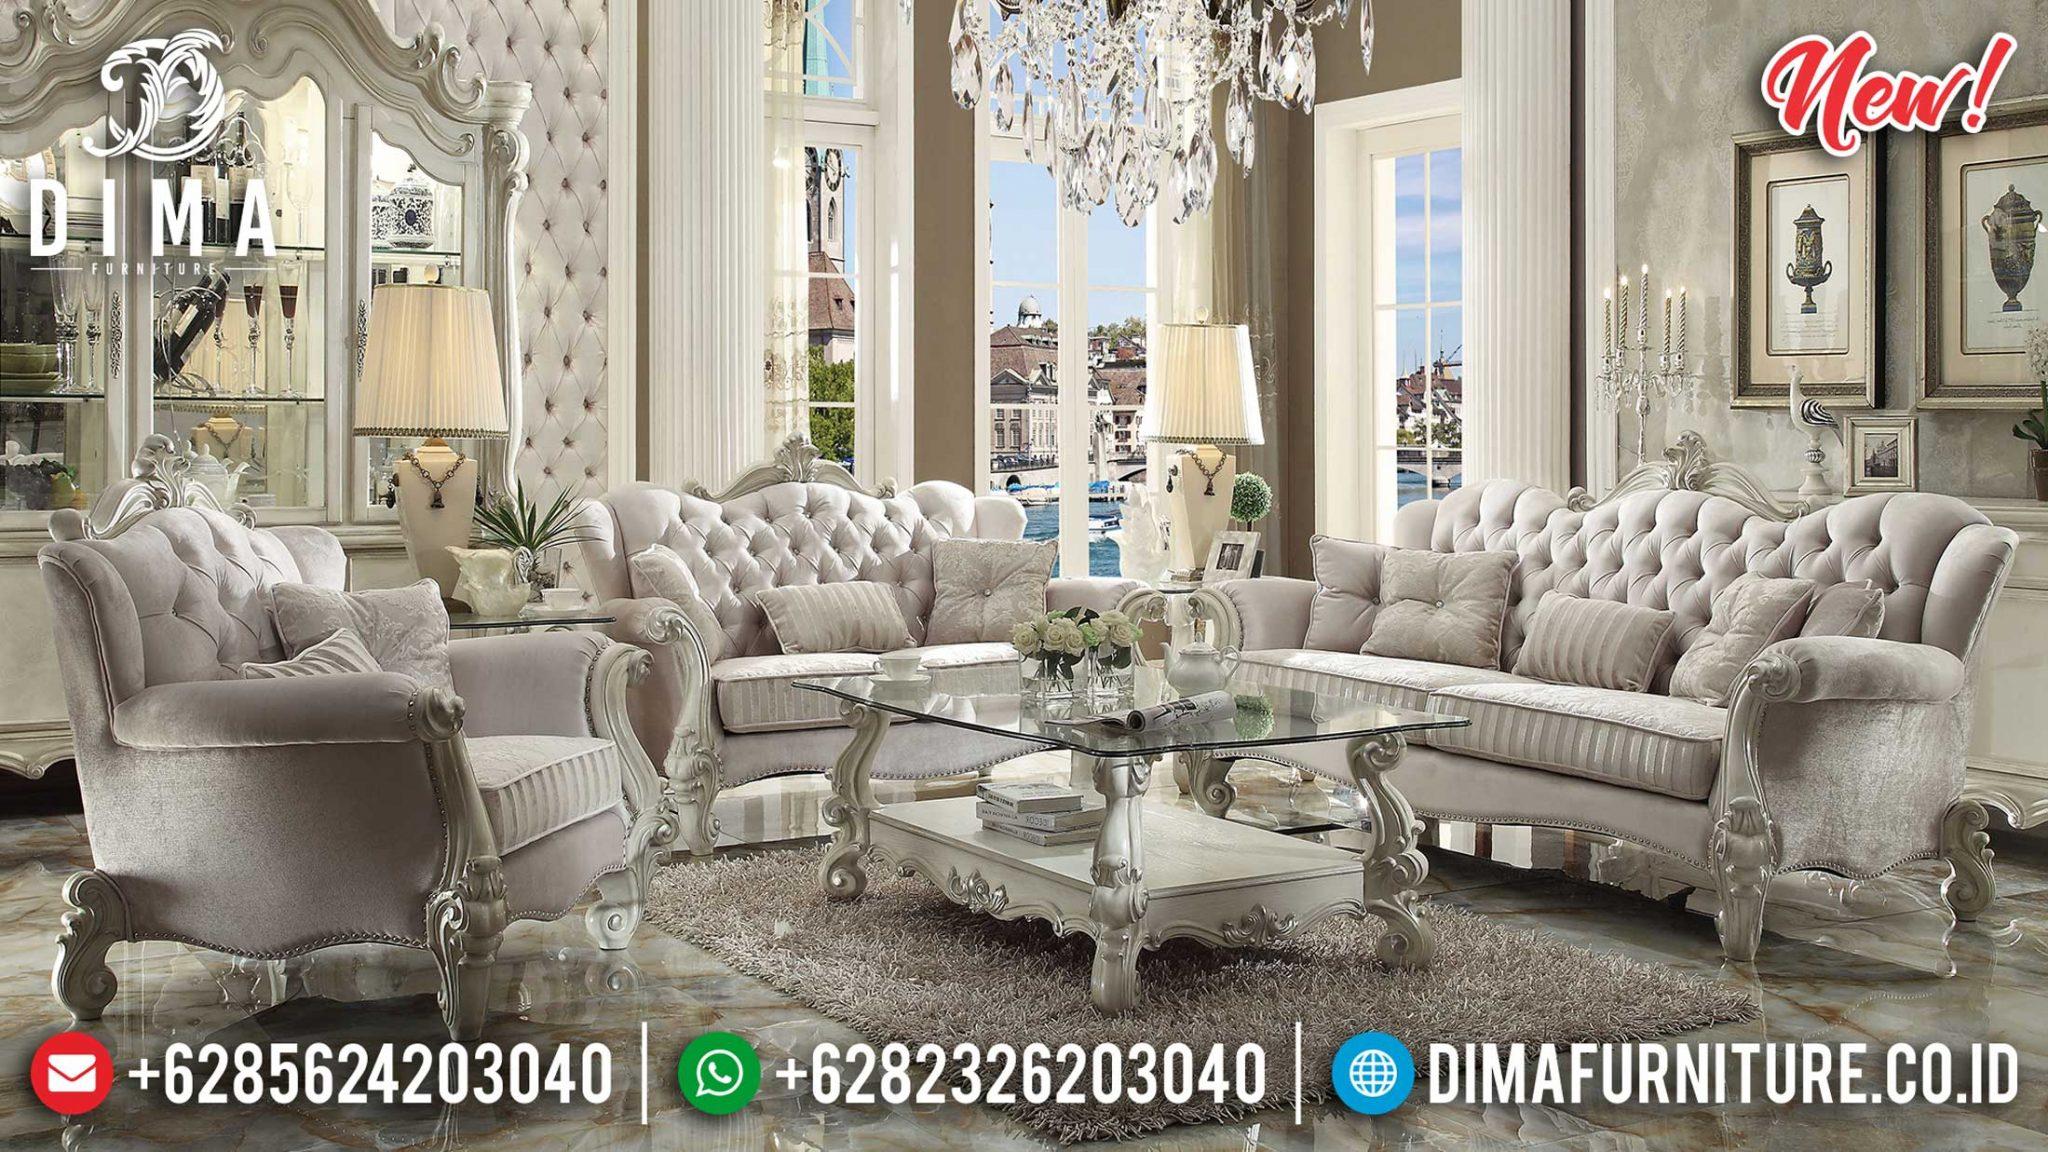 New Sofa Tamu Jepara Classic Design Luxury Carving Putih Ivory ST-1006